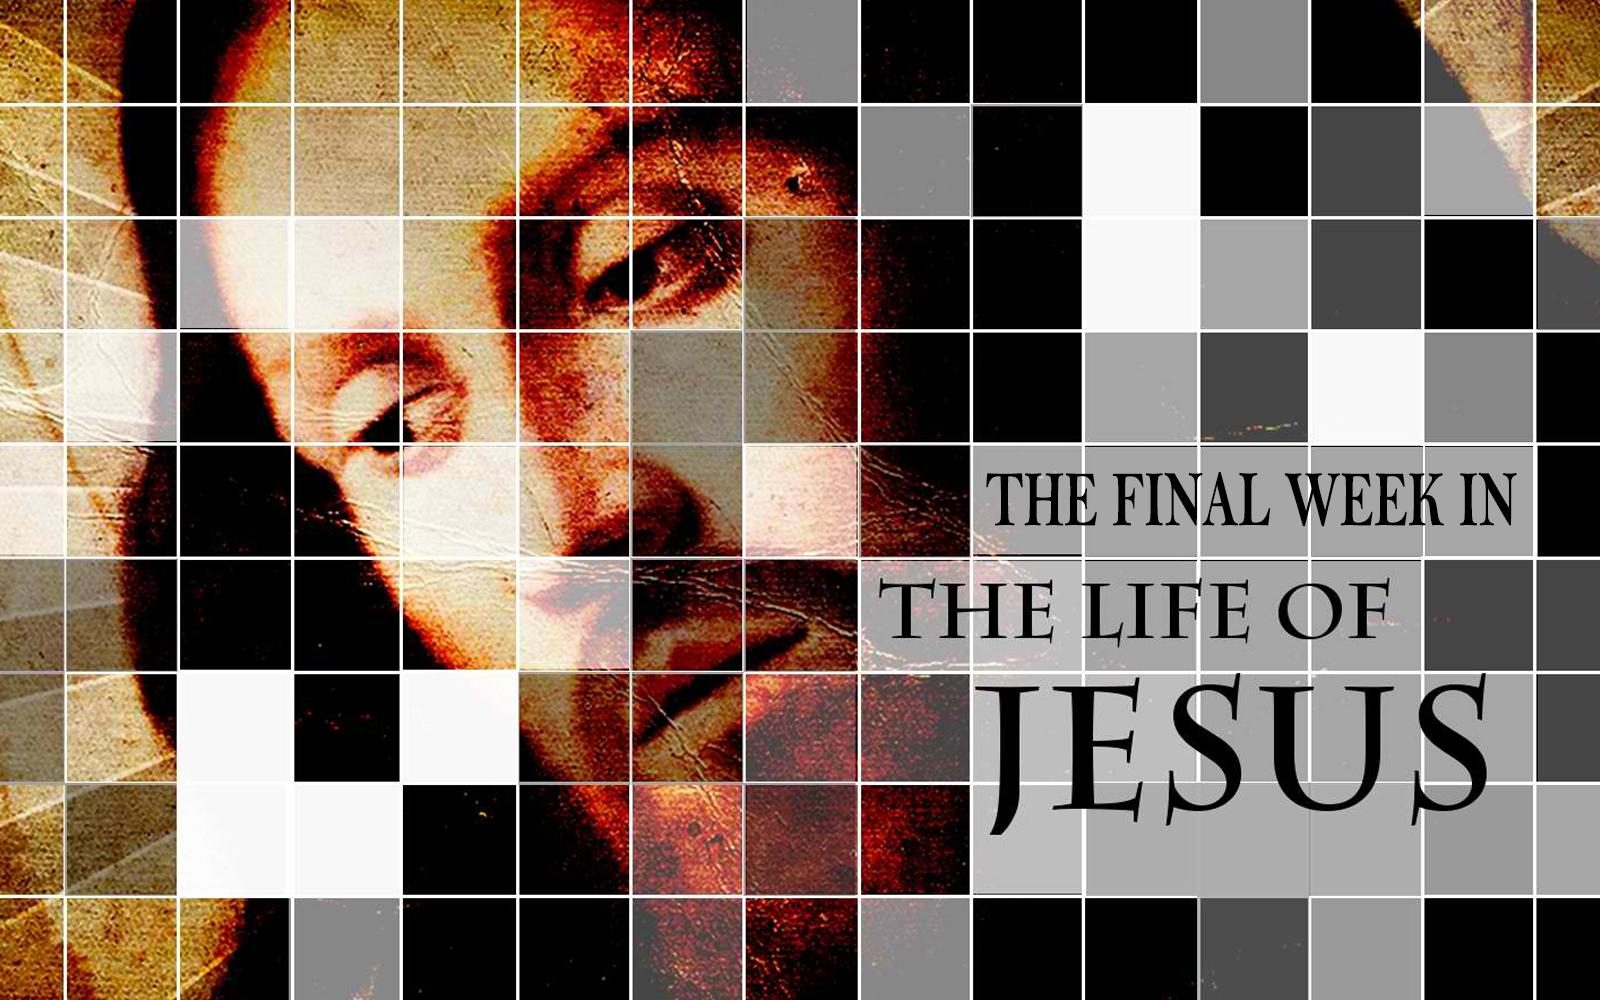 Jesus' Last Week Lapbook